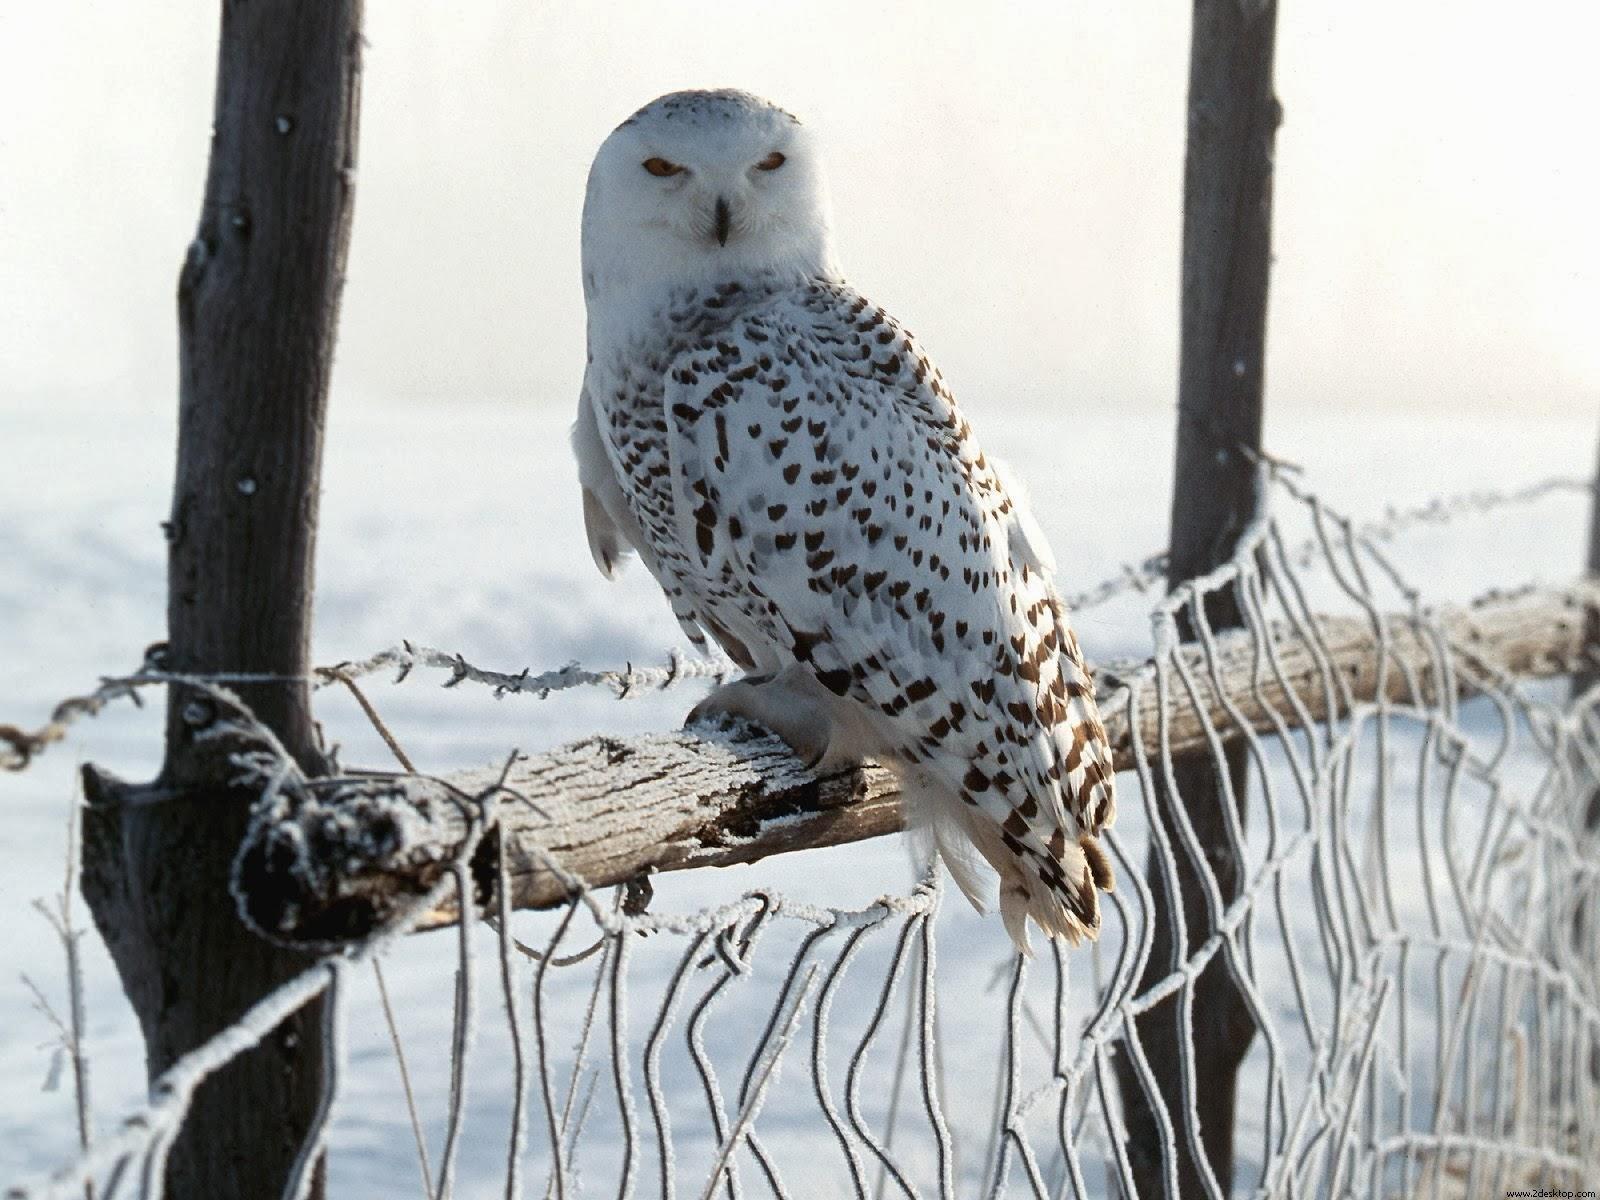 "<img src=""http://4.bp.blogspot.com/-cpMjSbrSiVw/Ut5F8e-rA3I/AAAAAAAAJiA/A5u4PMb47Y0/s1600/white-winter-owl.jpg"" alt=""white winter owl"" />"